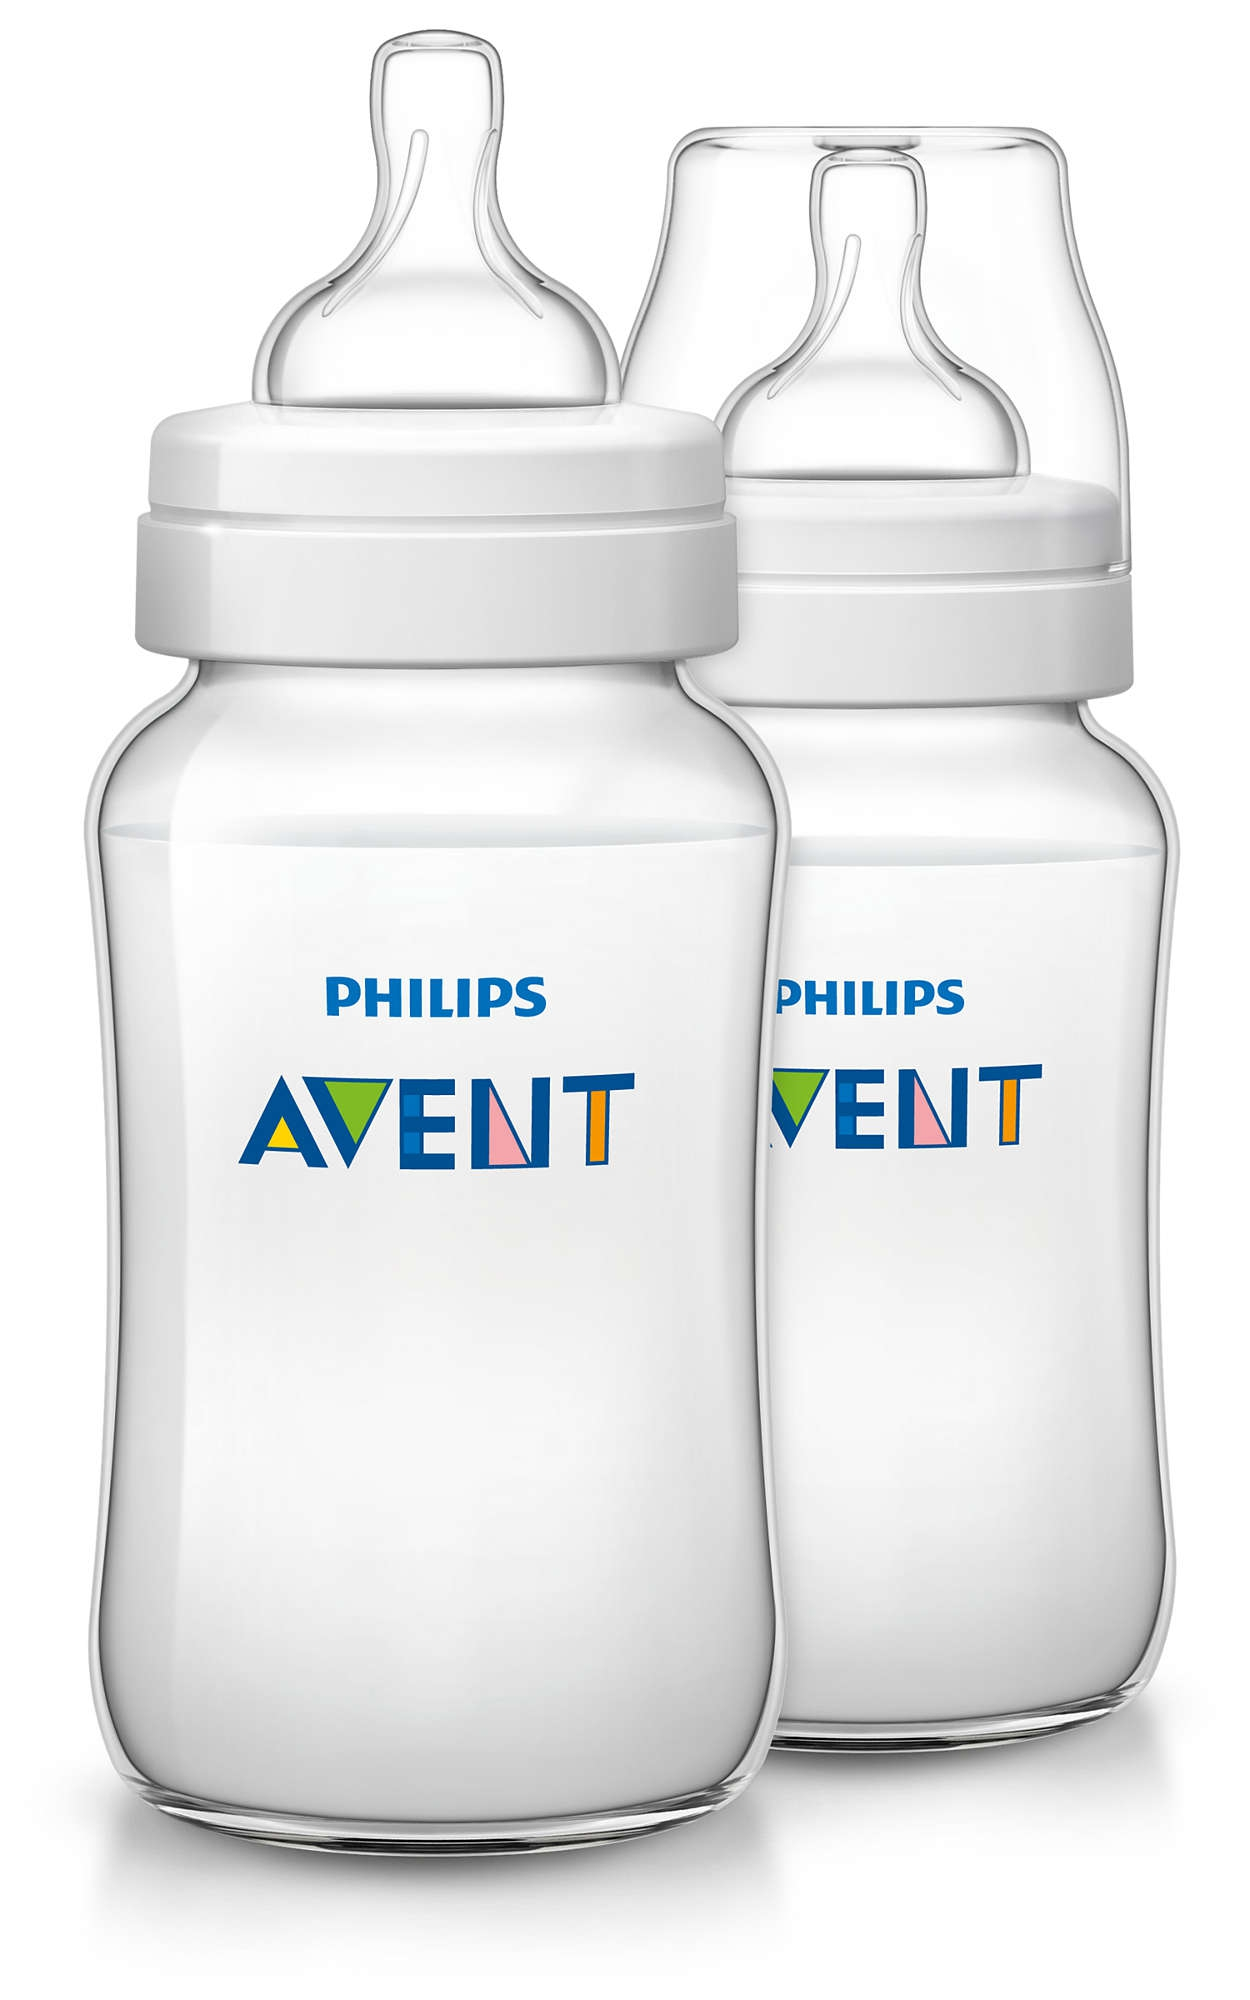 Бутылочки Philips AVENT Бутылочка Philips AVENT «Classic+» с силиконовой соской с 3 мес. 330 мл (2 бутылочки)